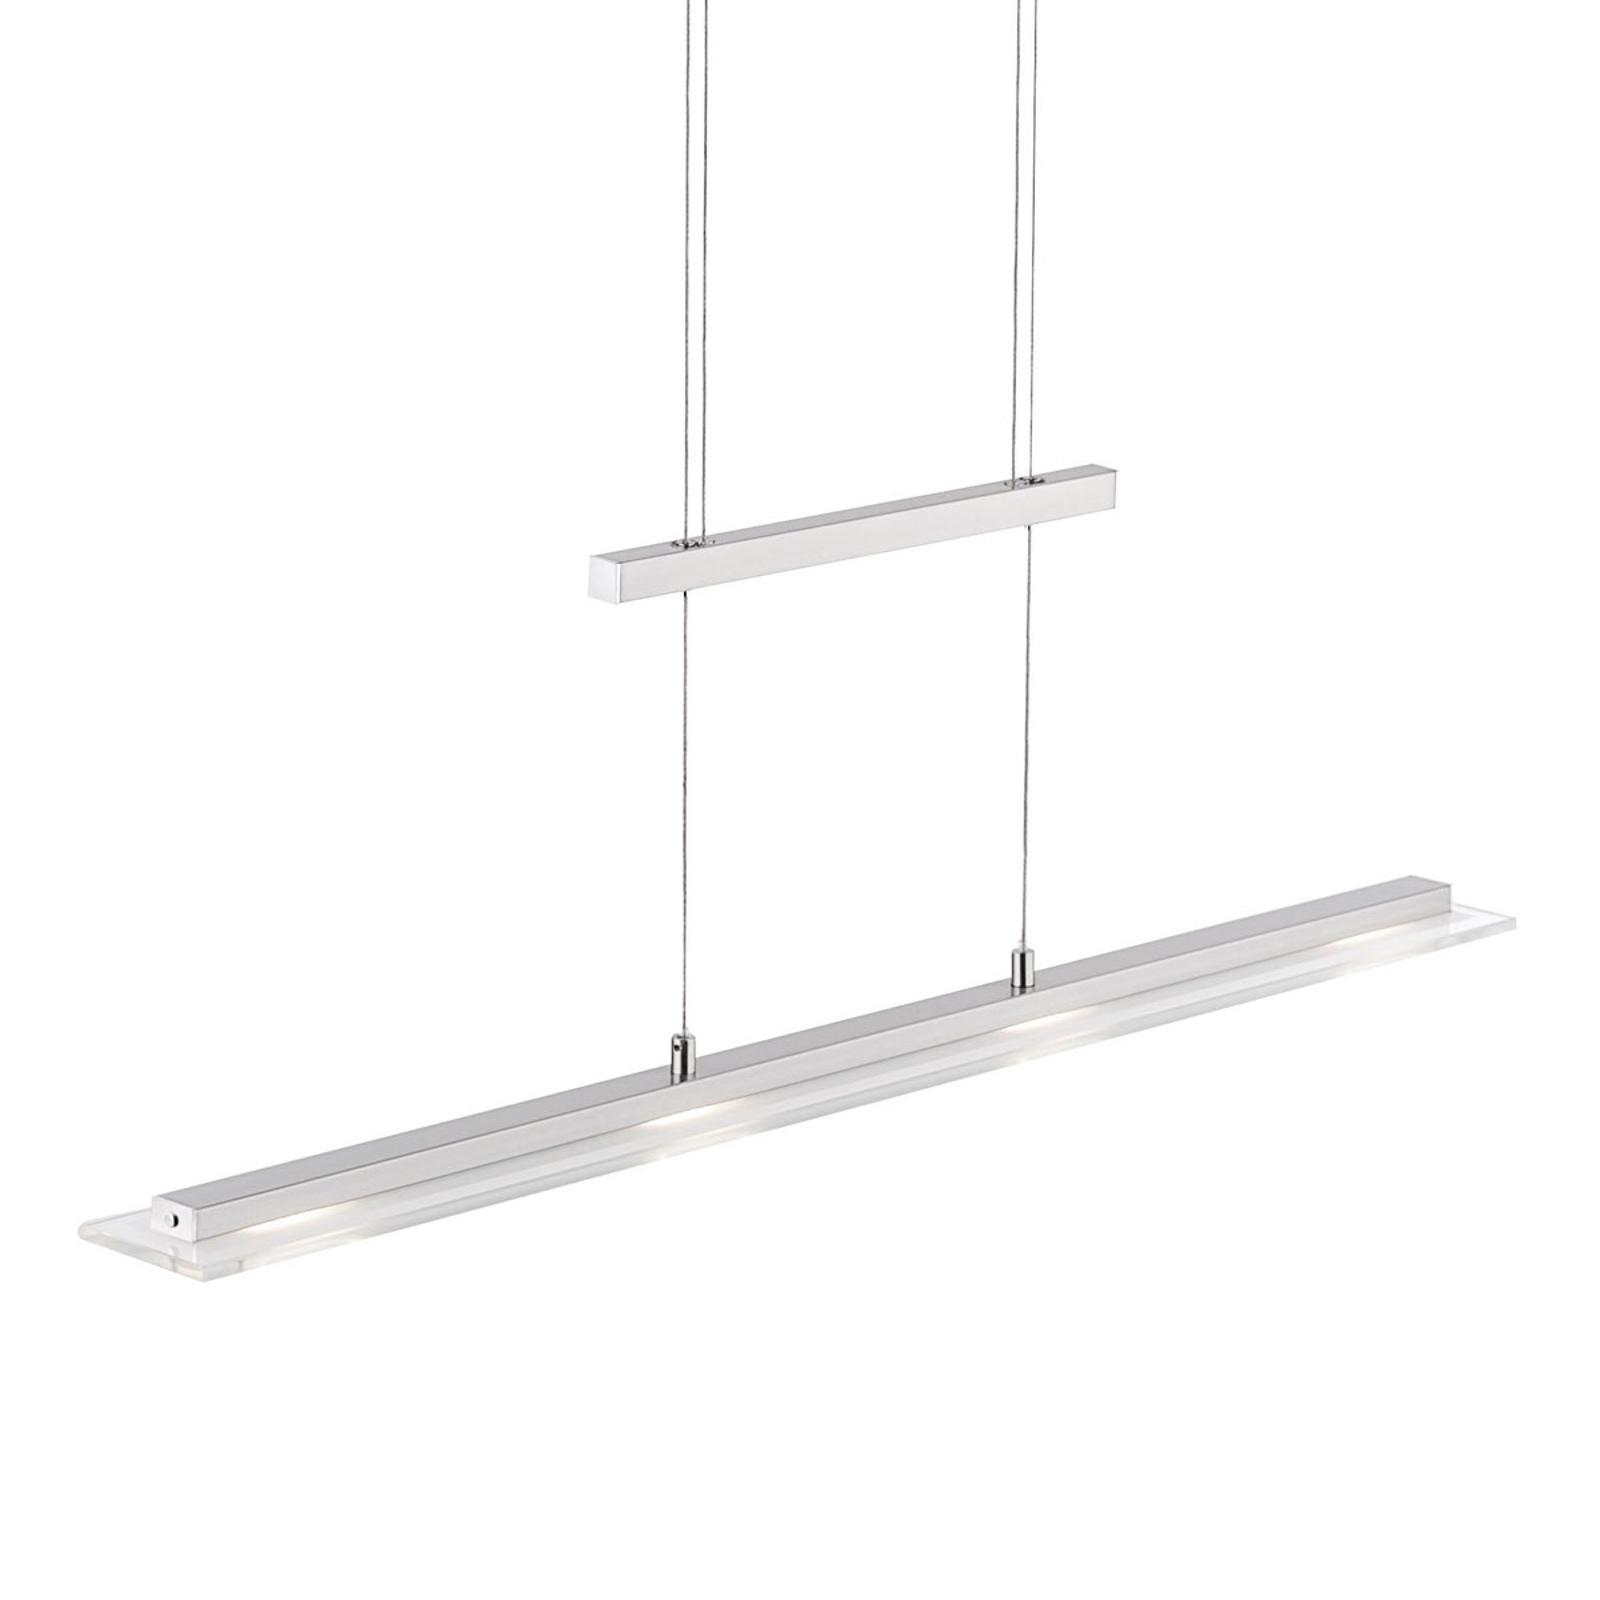 Lámpara colgante LED Tenso tunable white, 64 cm